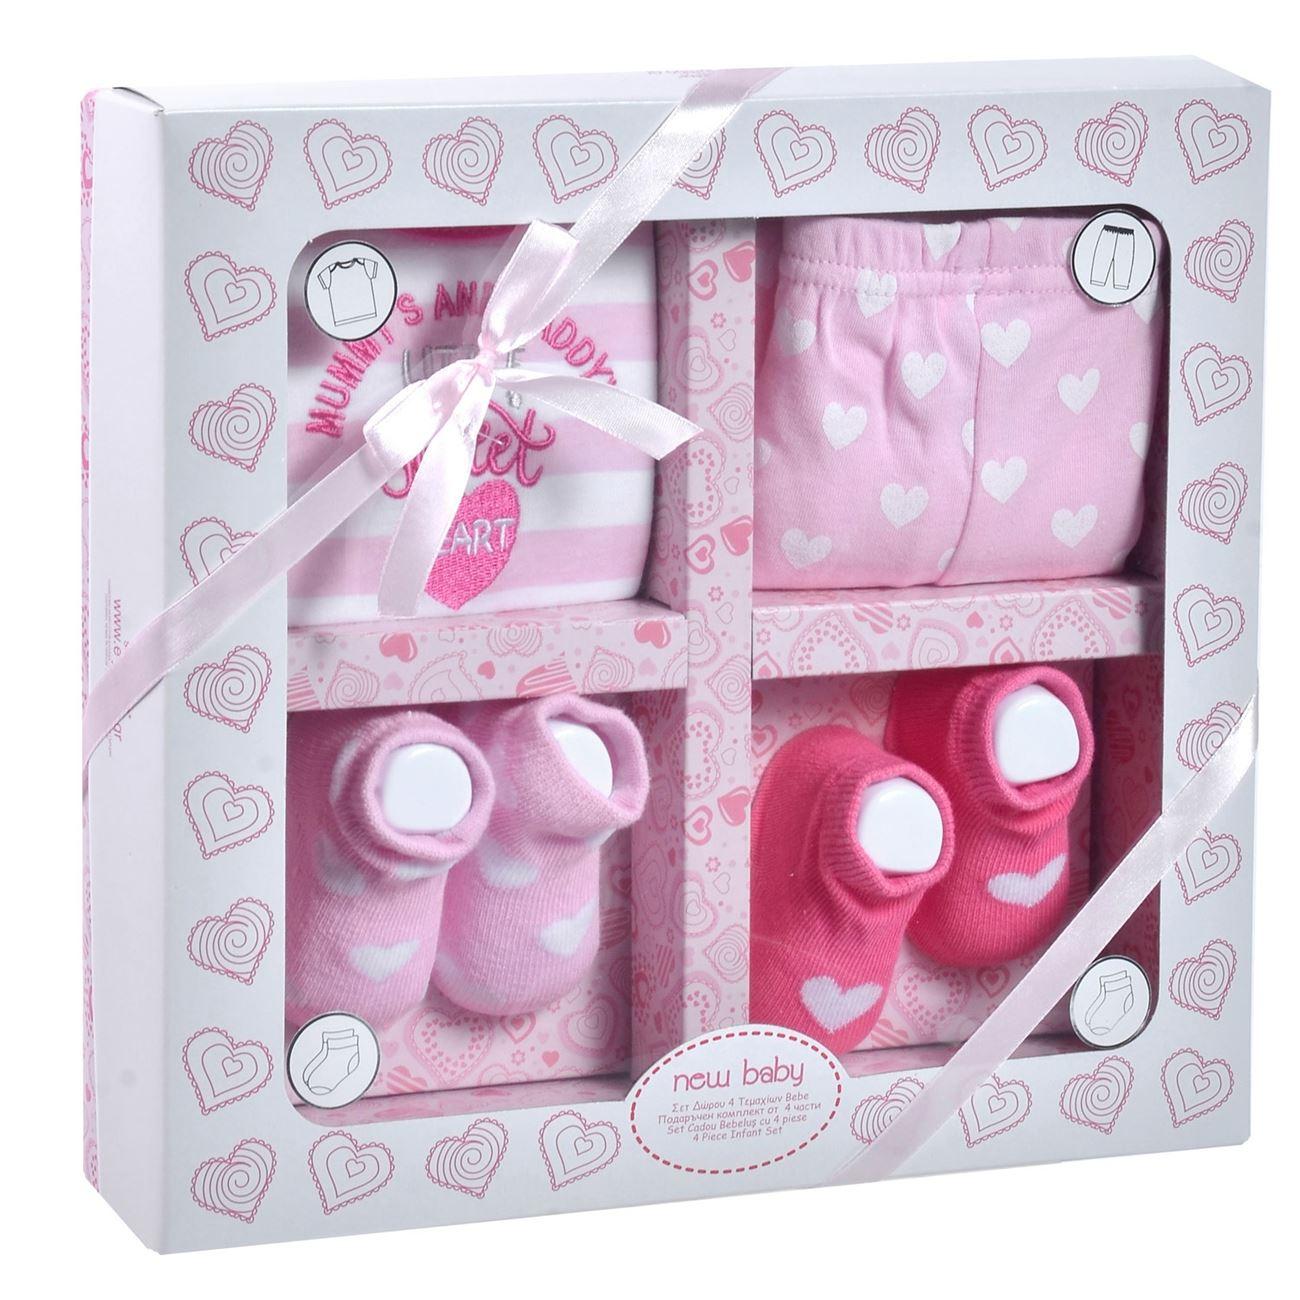 a7f68d901f8 Σετ Δώρου Για Νεογέννητο Ροζ Καρδιές < Σετ Δώρου για Νεογέννητο ...